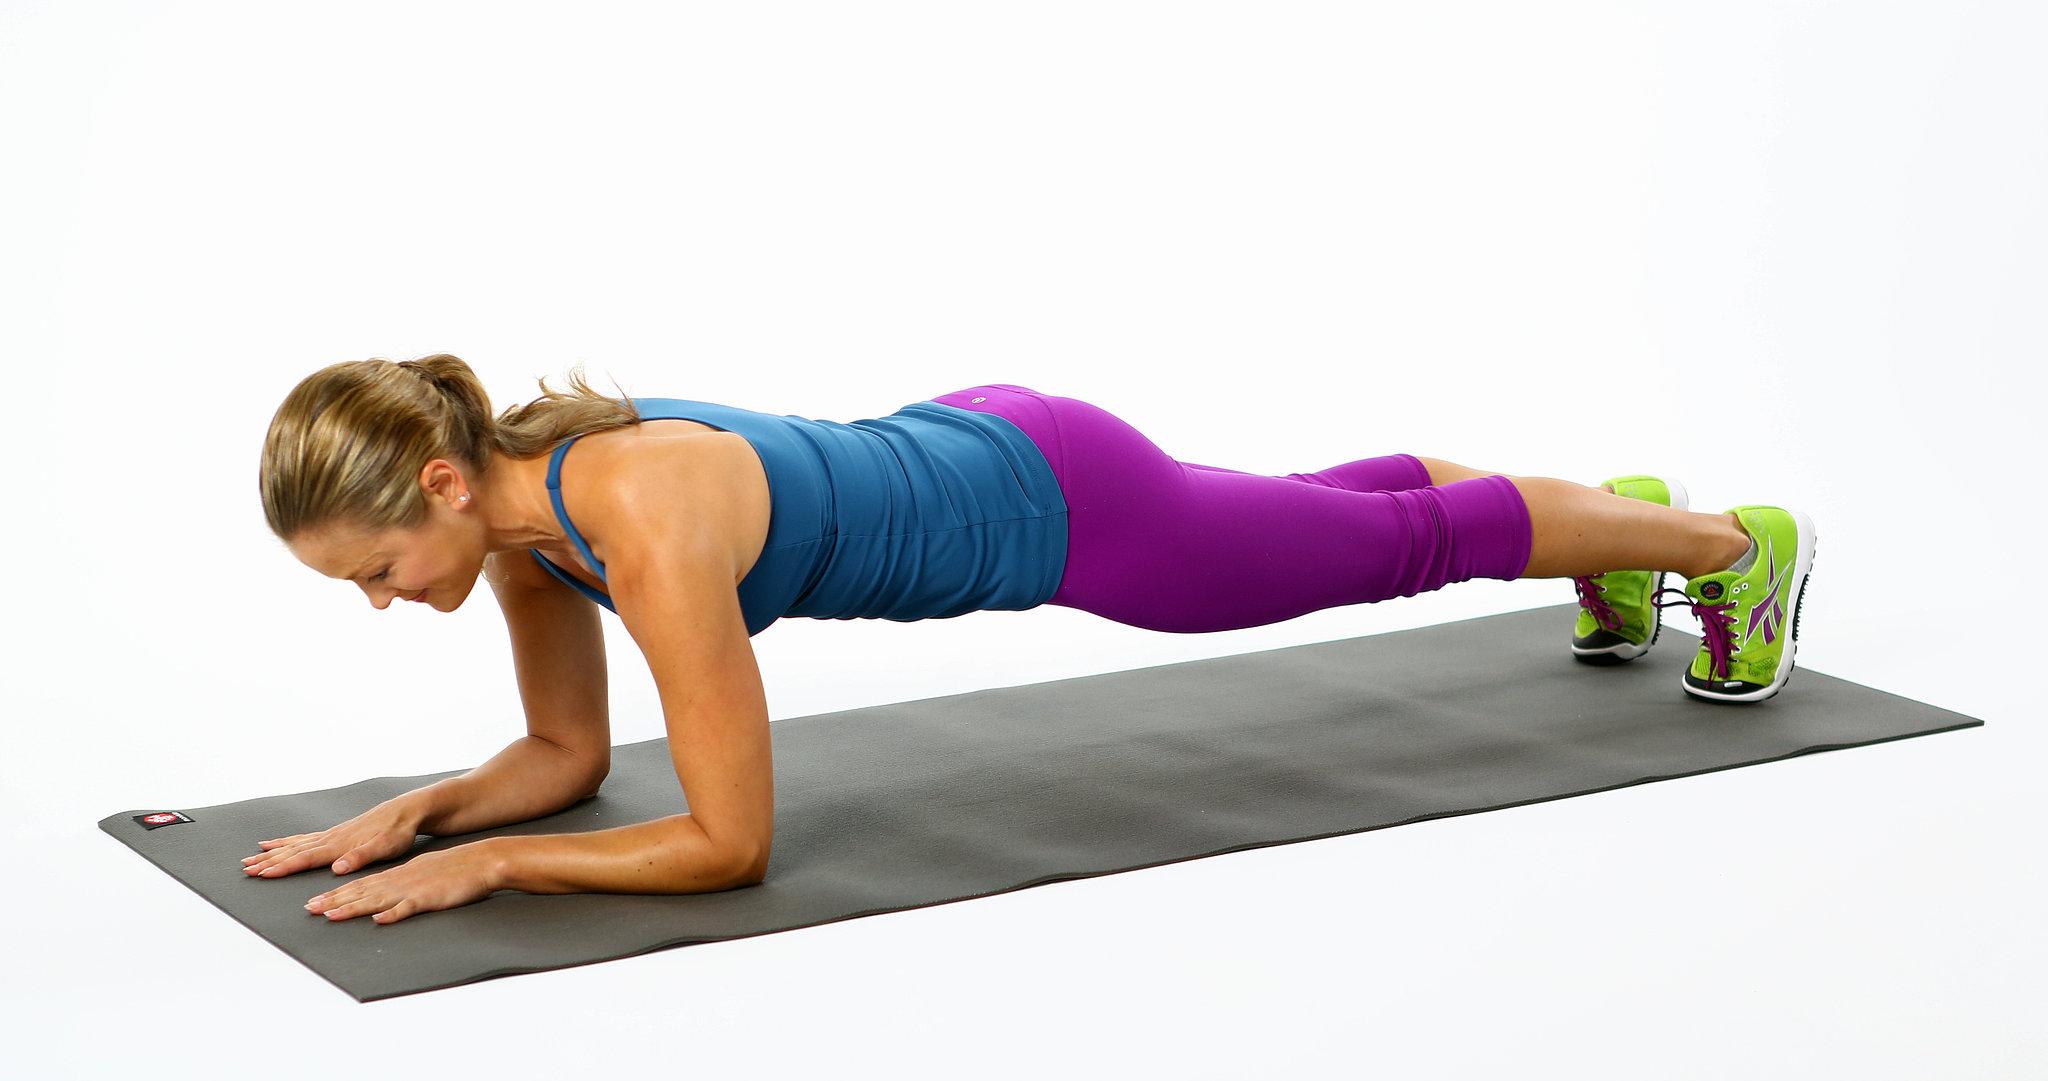 Vzpor plank